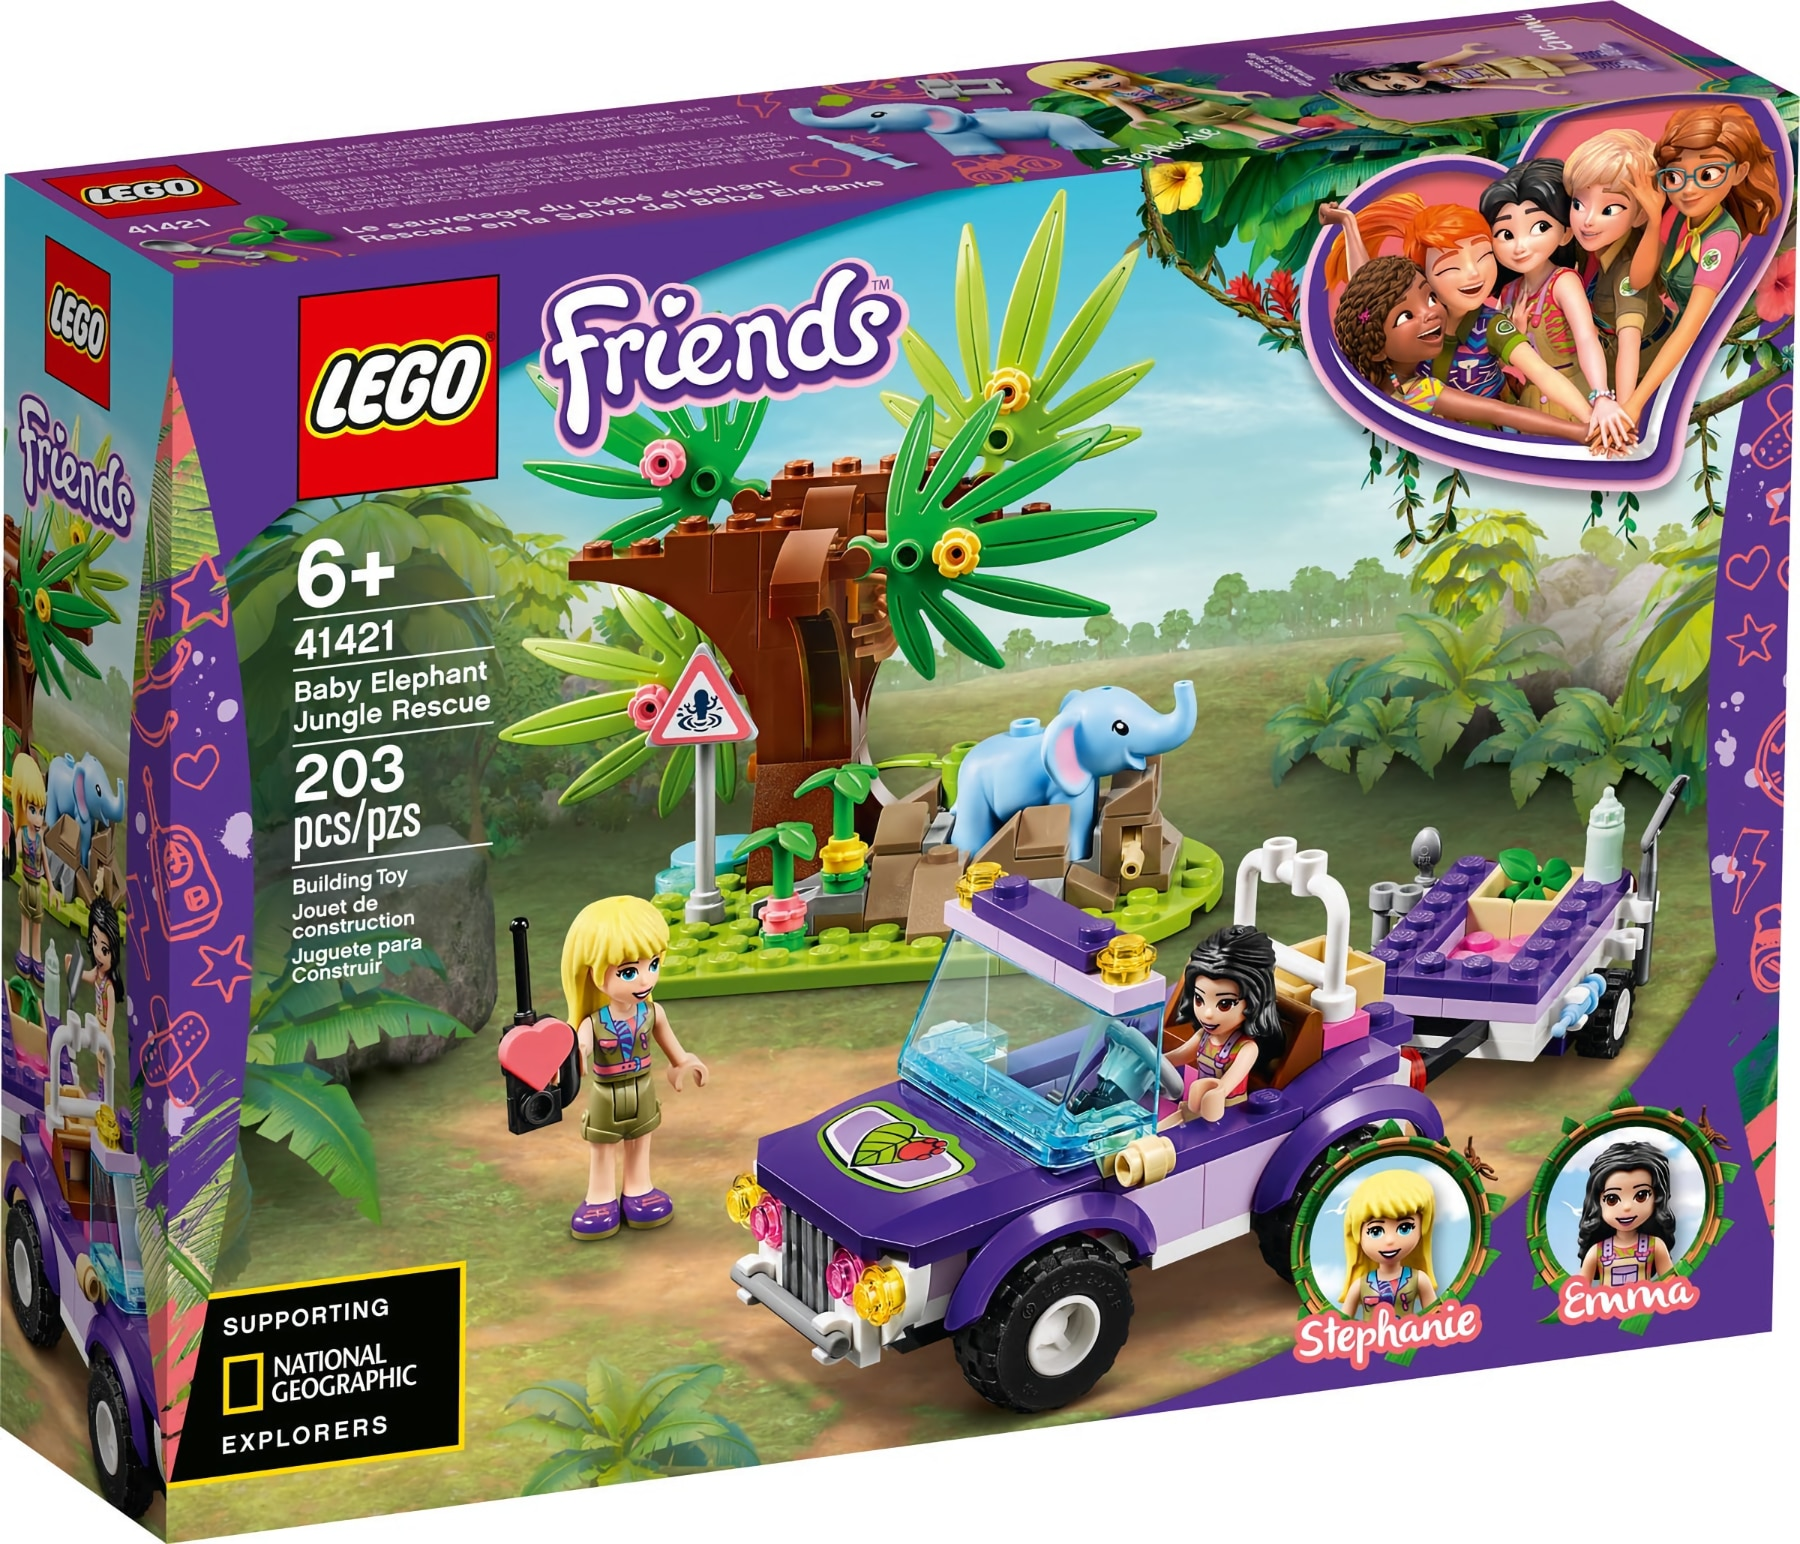 LEGO Friends 41421 Rettung Des Elefantenbabys